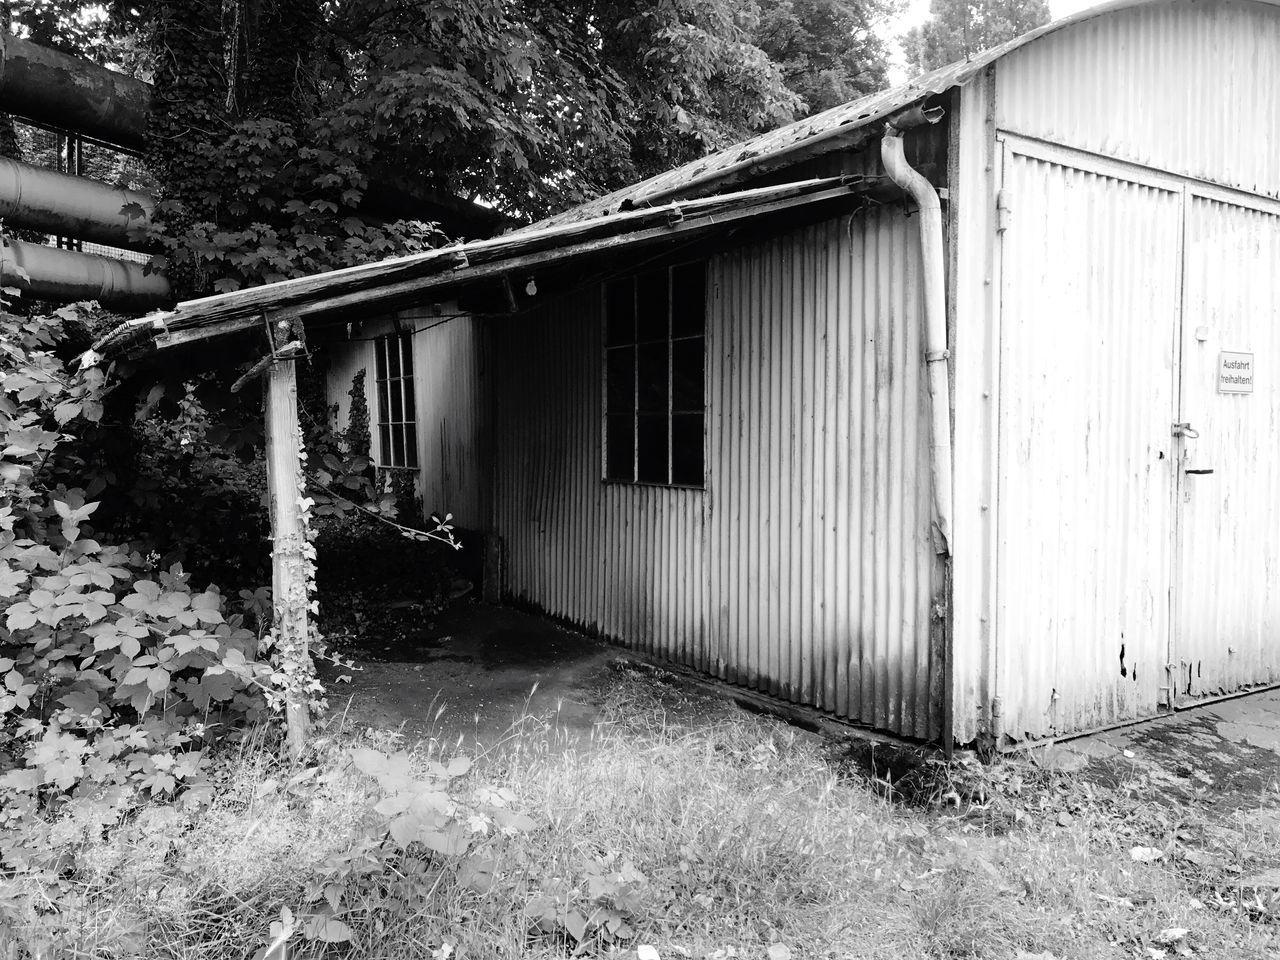 Built Structure Old Garage Old Buildings Blackandwhite Black & White